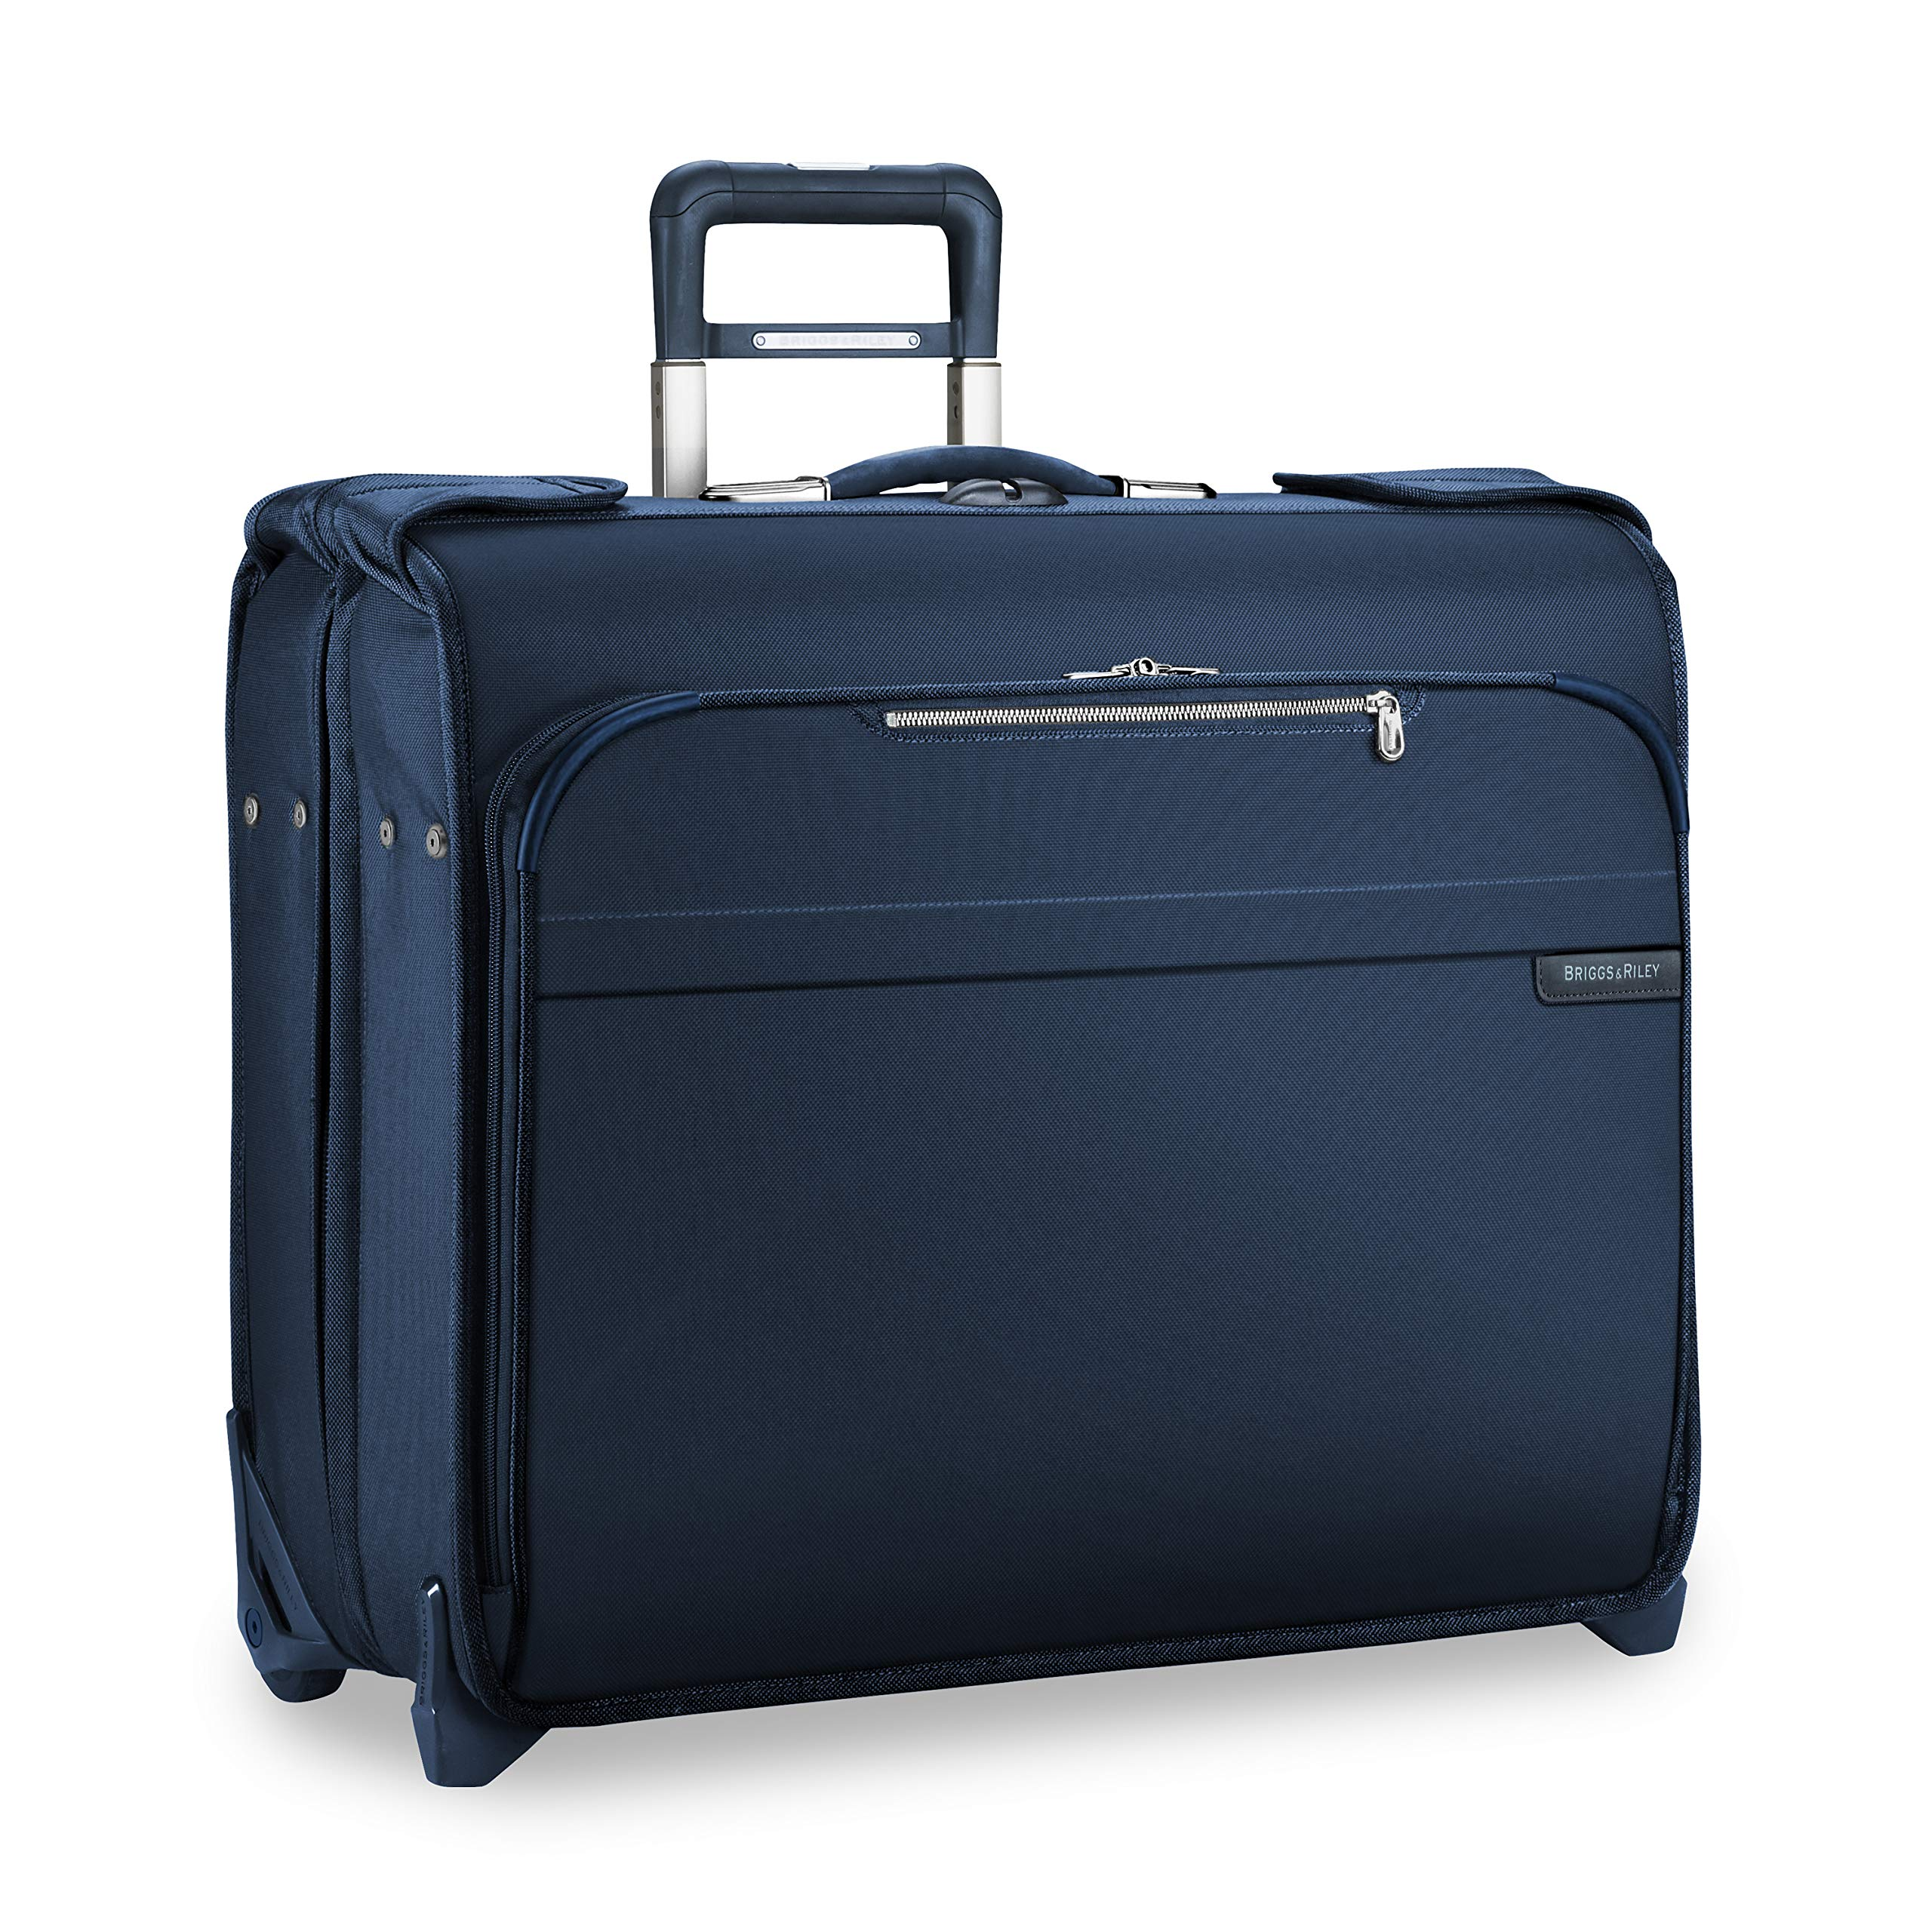 Briggs & Riley Baseline Deluxe Garment Bag, 2 Wheel, Navy